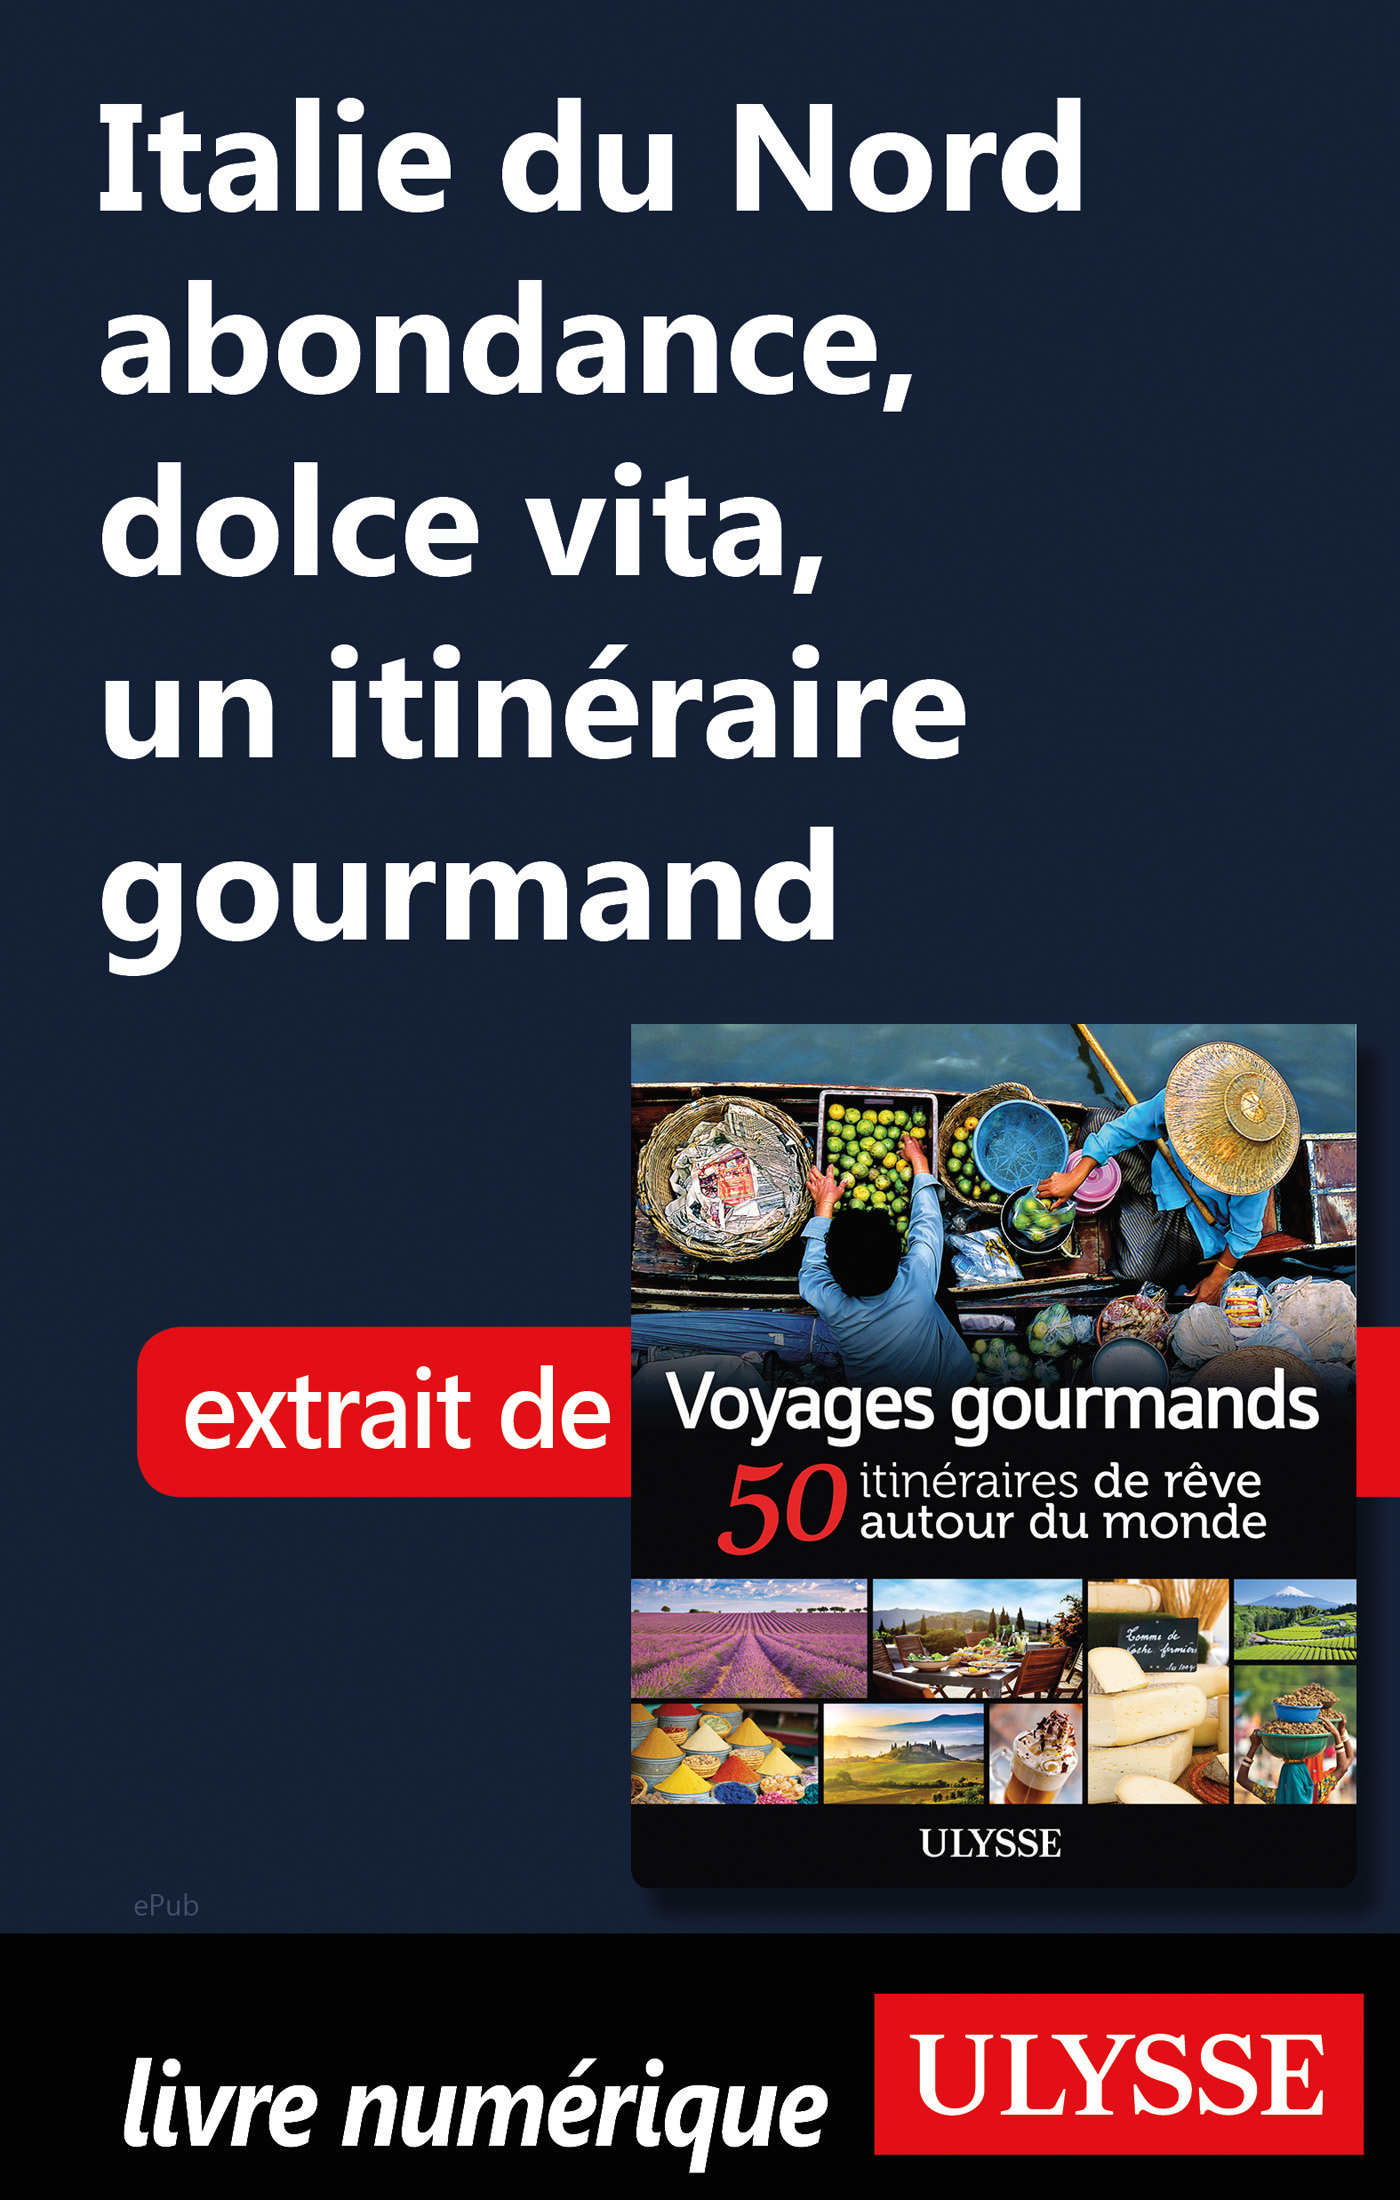 Italie du Nord abondance, dolce vita - Un itinéraire gourmand